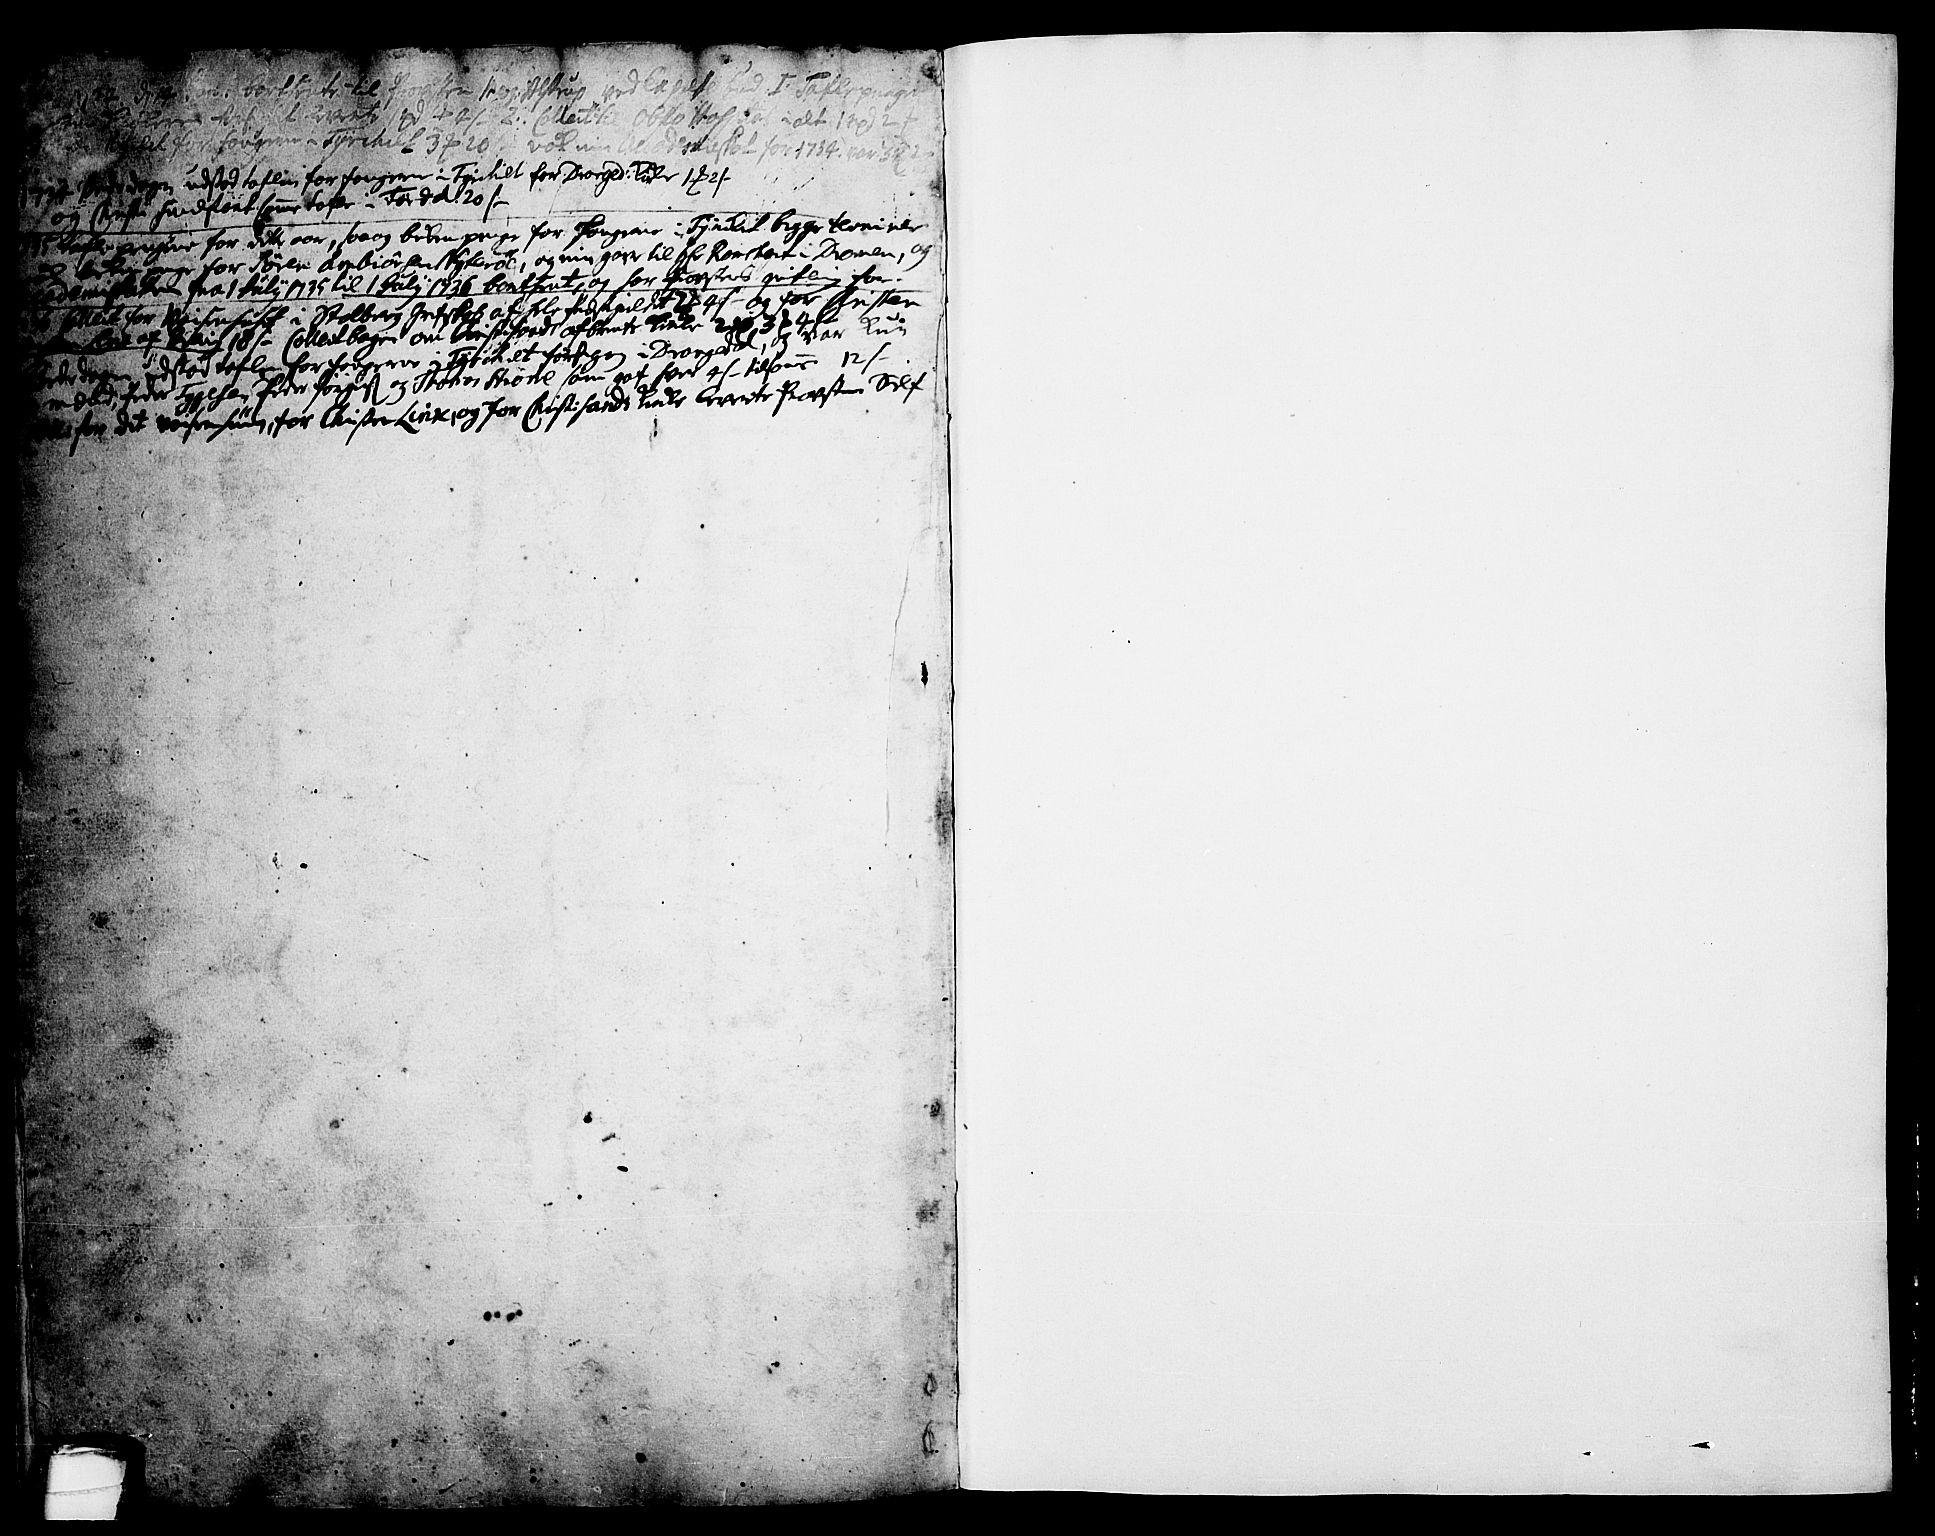 SAKO, Drangedal kirkebøker, F/Fa/L0002: Ministerialbok nr. 2, 1733-1753, s. 67-68